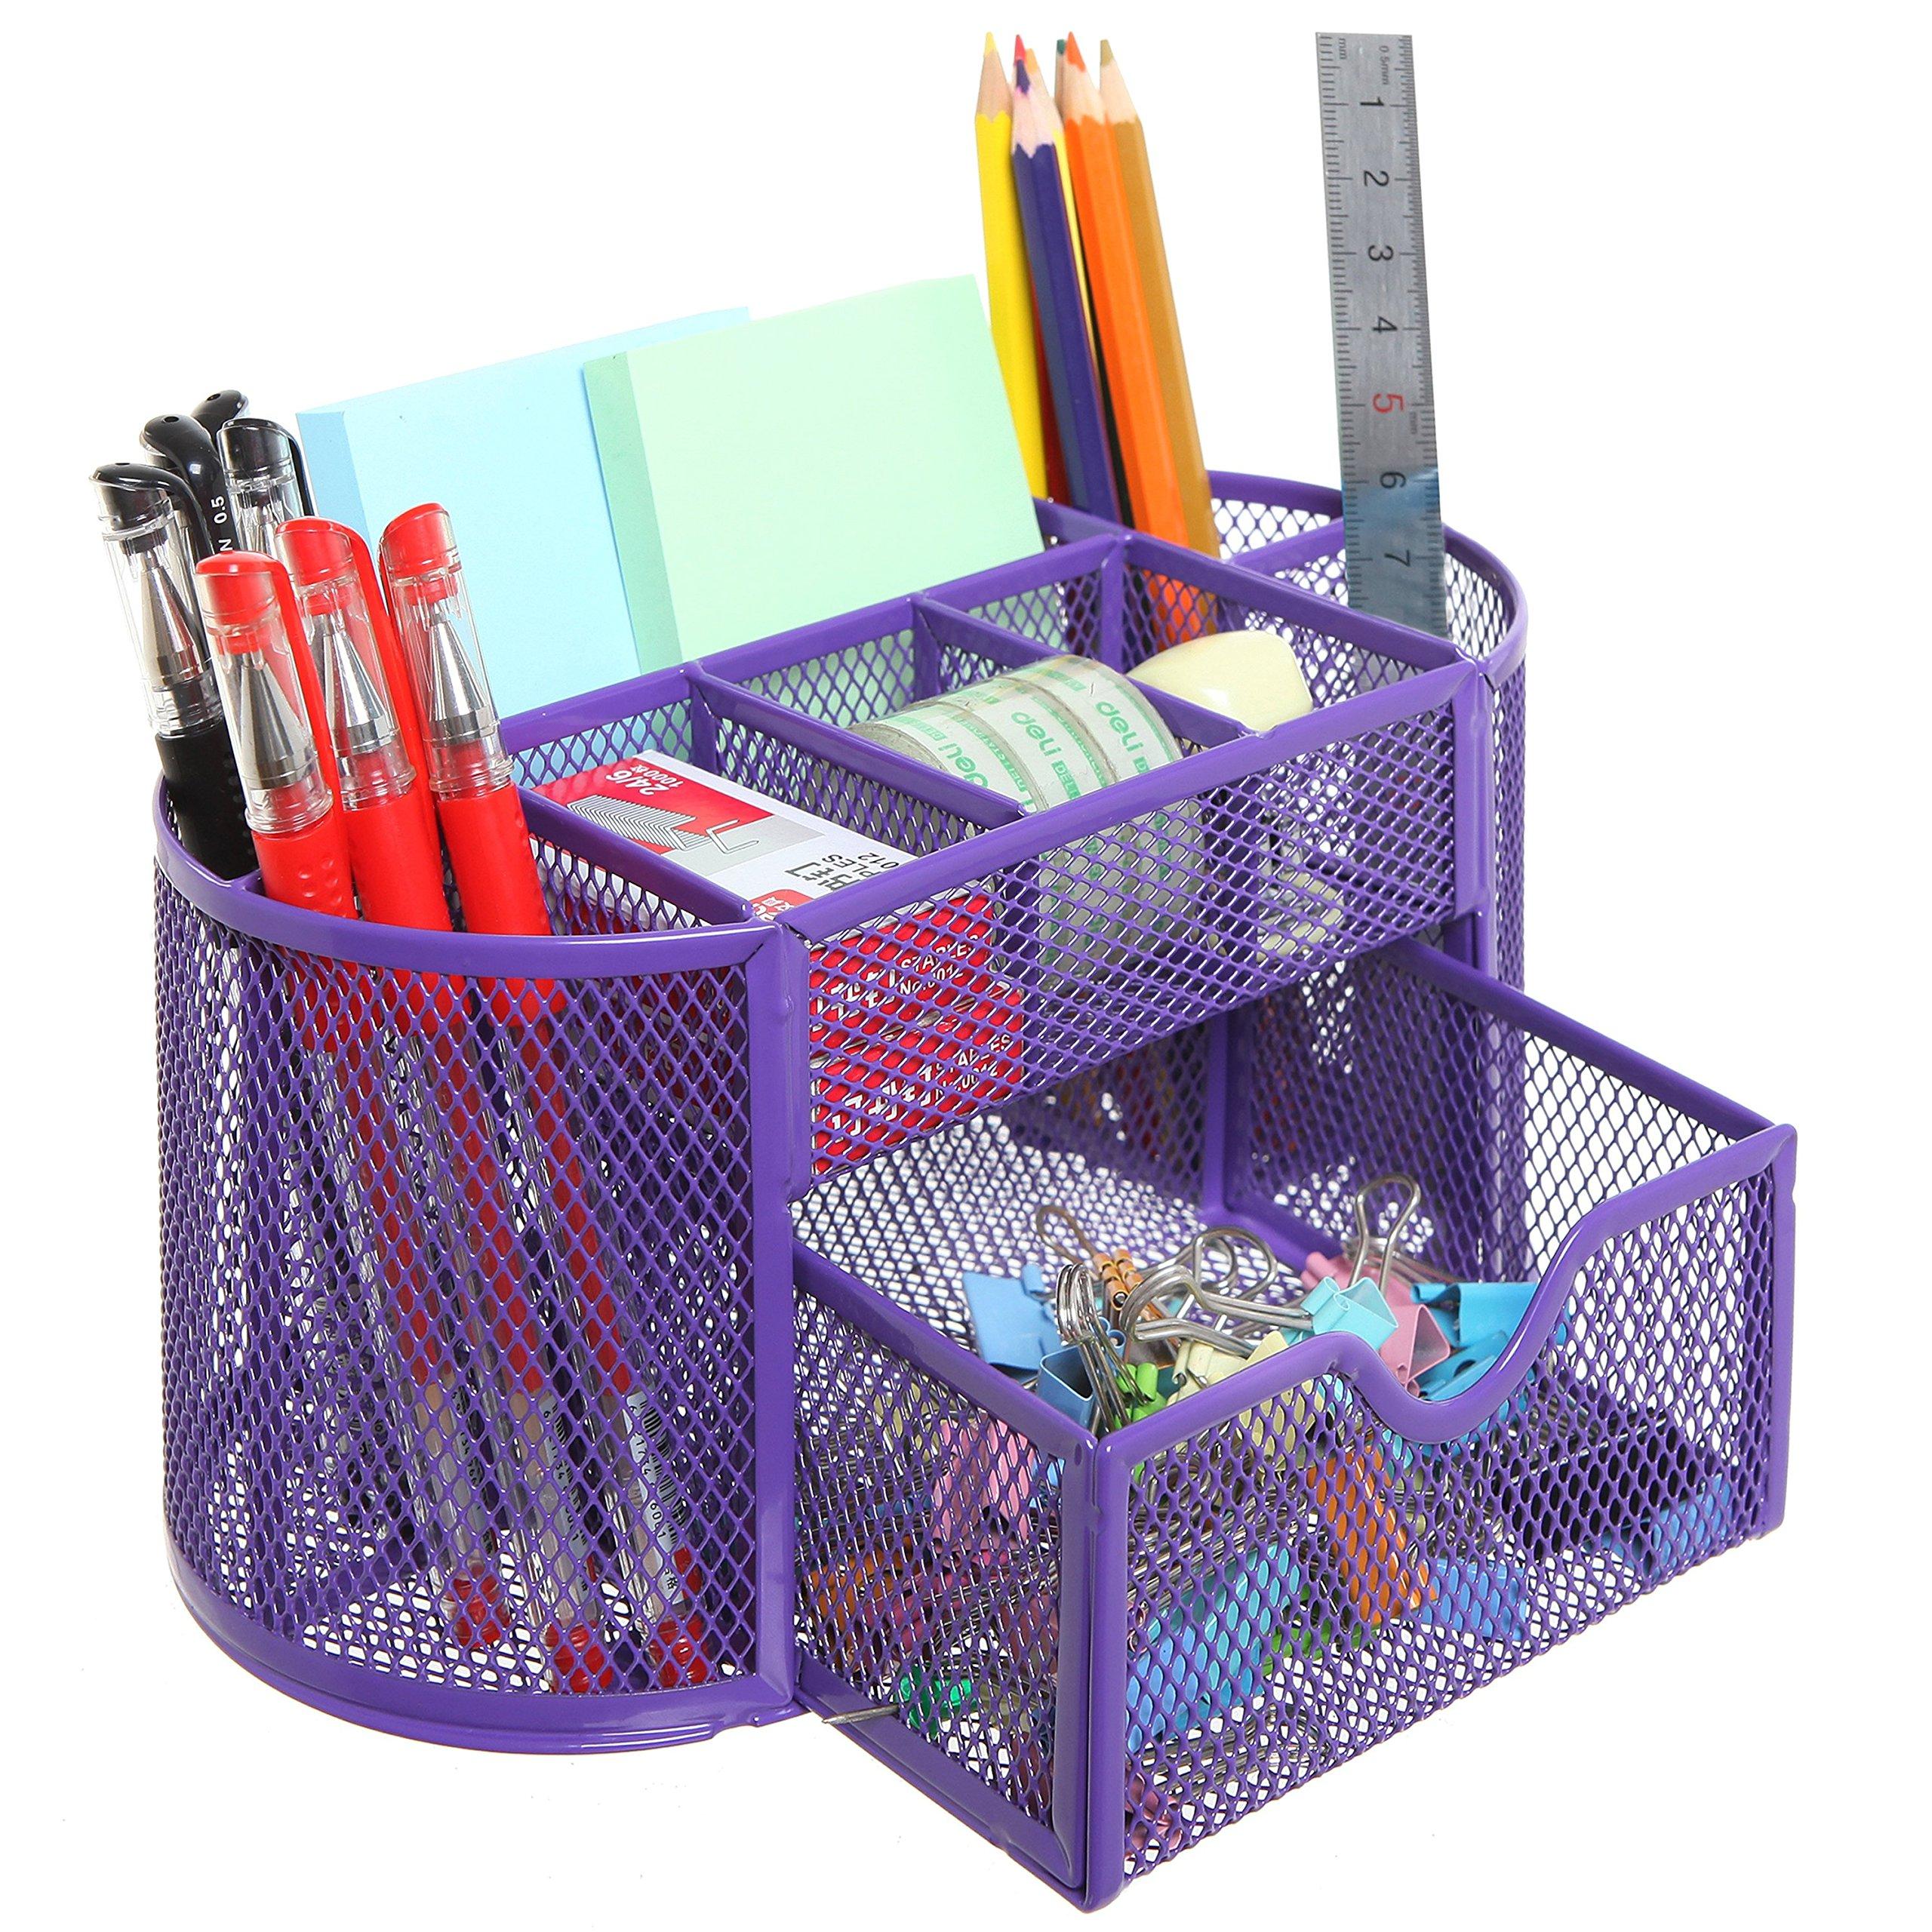 MyGift Space Saving Purple Metal Wire 8 Compartment Office / School Supply Desktop Organizer Caddy w/ Drawer